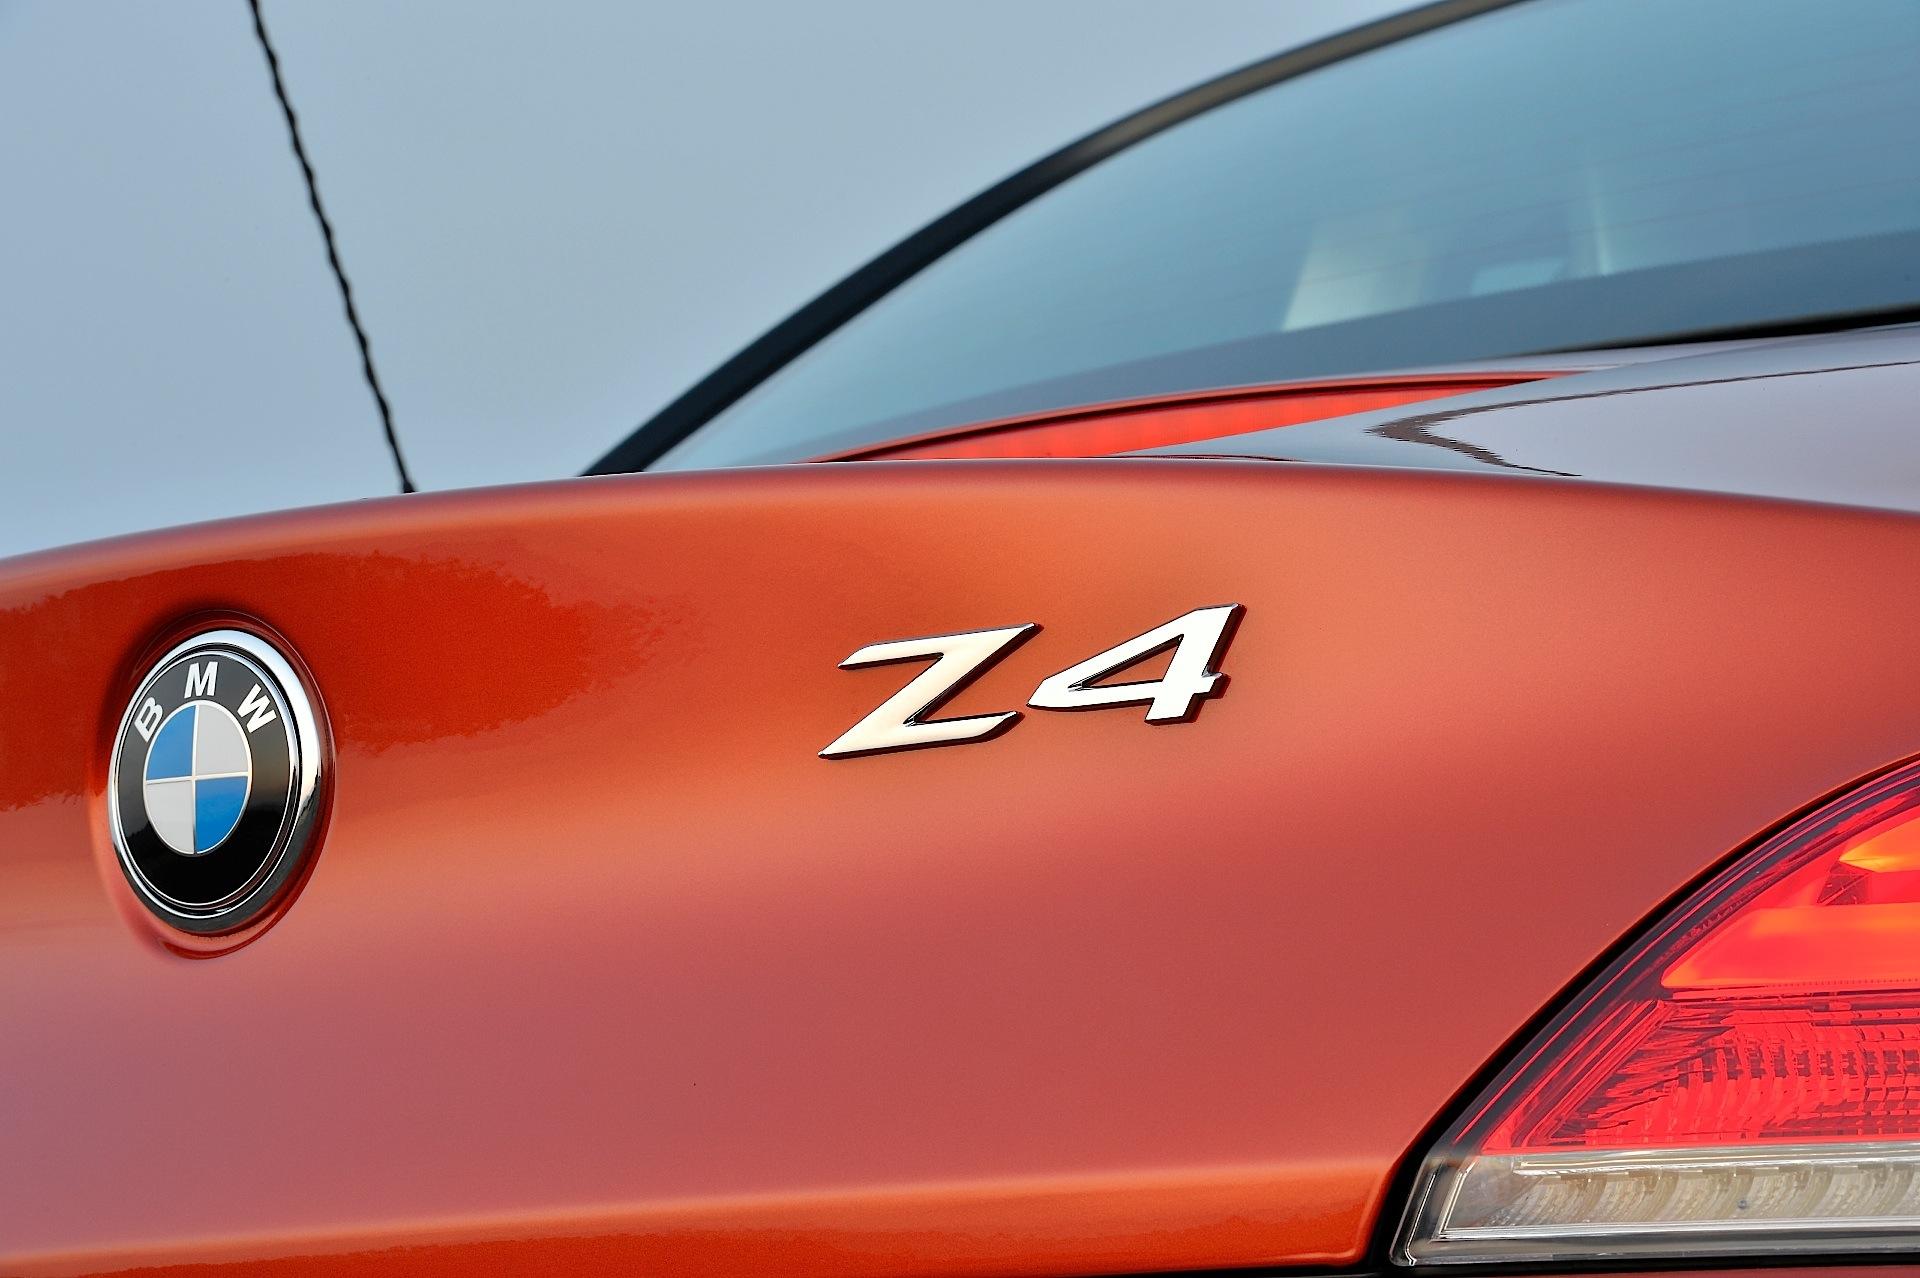 Bmw Z4 Roadster E89 Specs 2009 2010 2011 2012 2013